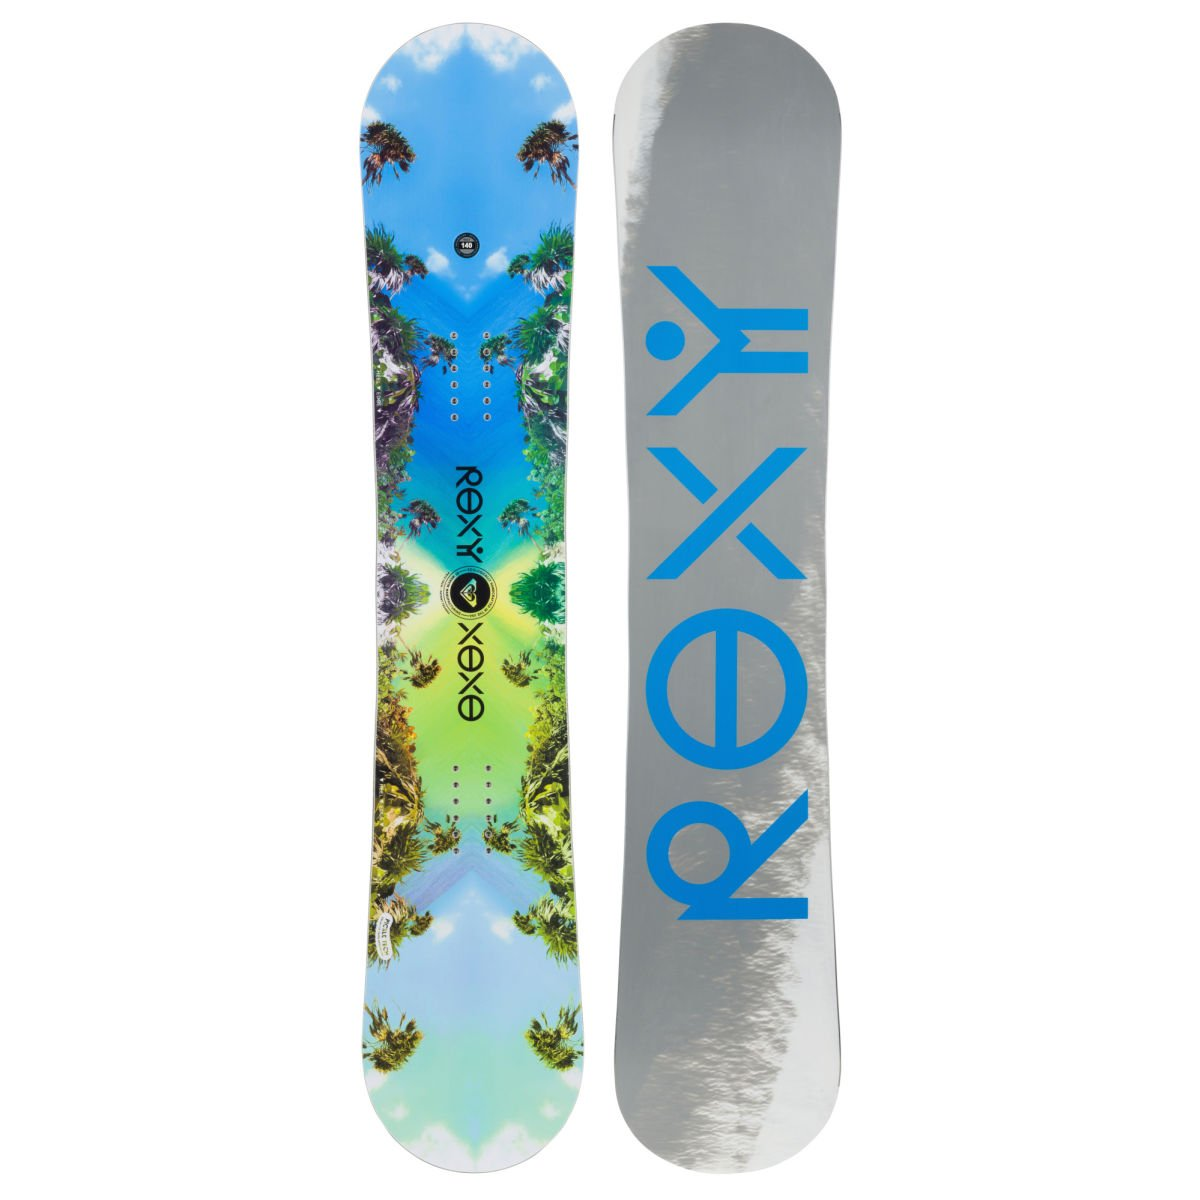 51335446f8b5 Freestyle Snowboard Women Roxy XOXO PBTX 143 2015  Amazon.co.uk  Sports    Outdoors